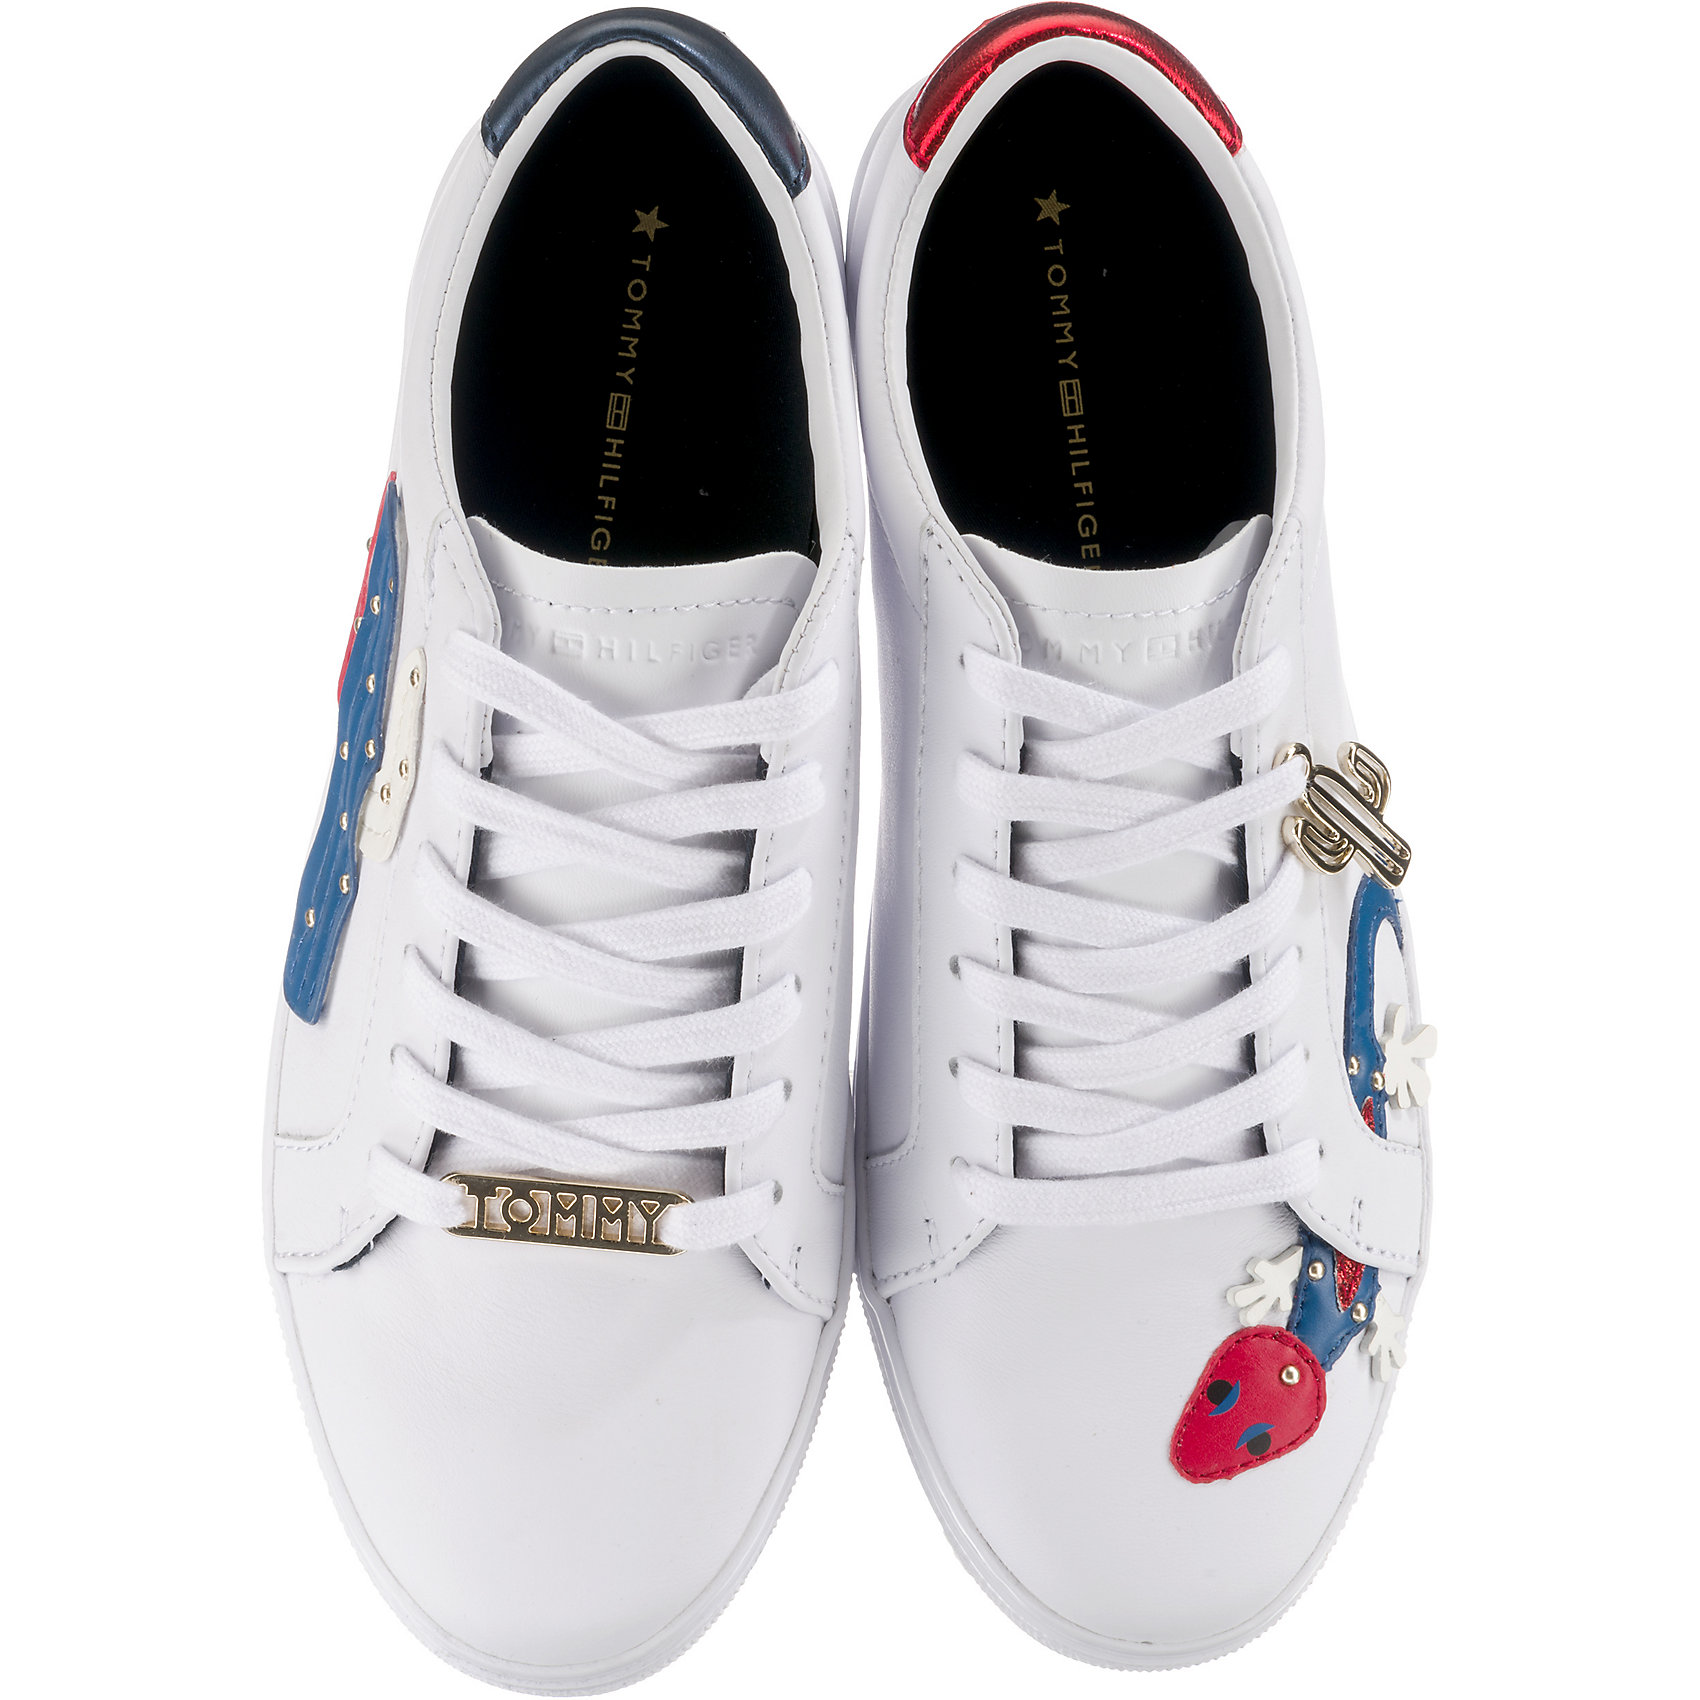 8bcaeb783bf6 Neu TOMMY HILFIGER EMBELISH ESSENTIAL SNEAKER Sneakers Low 8005098 ...